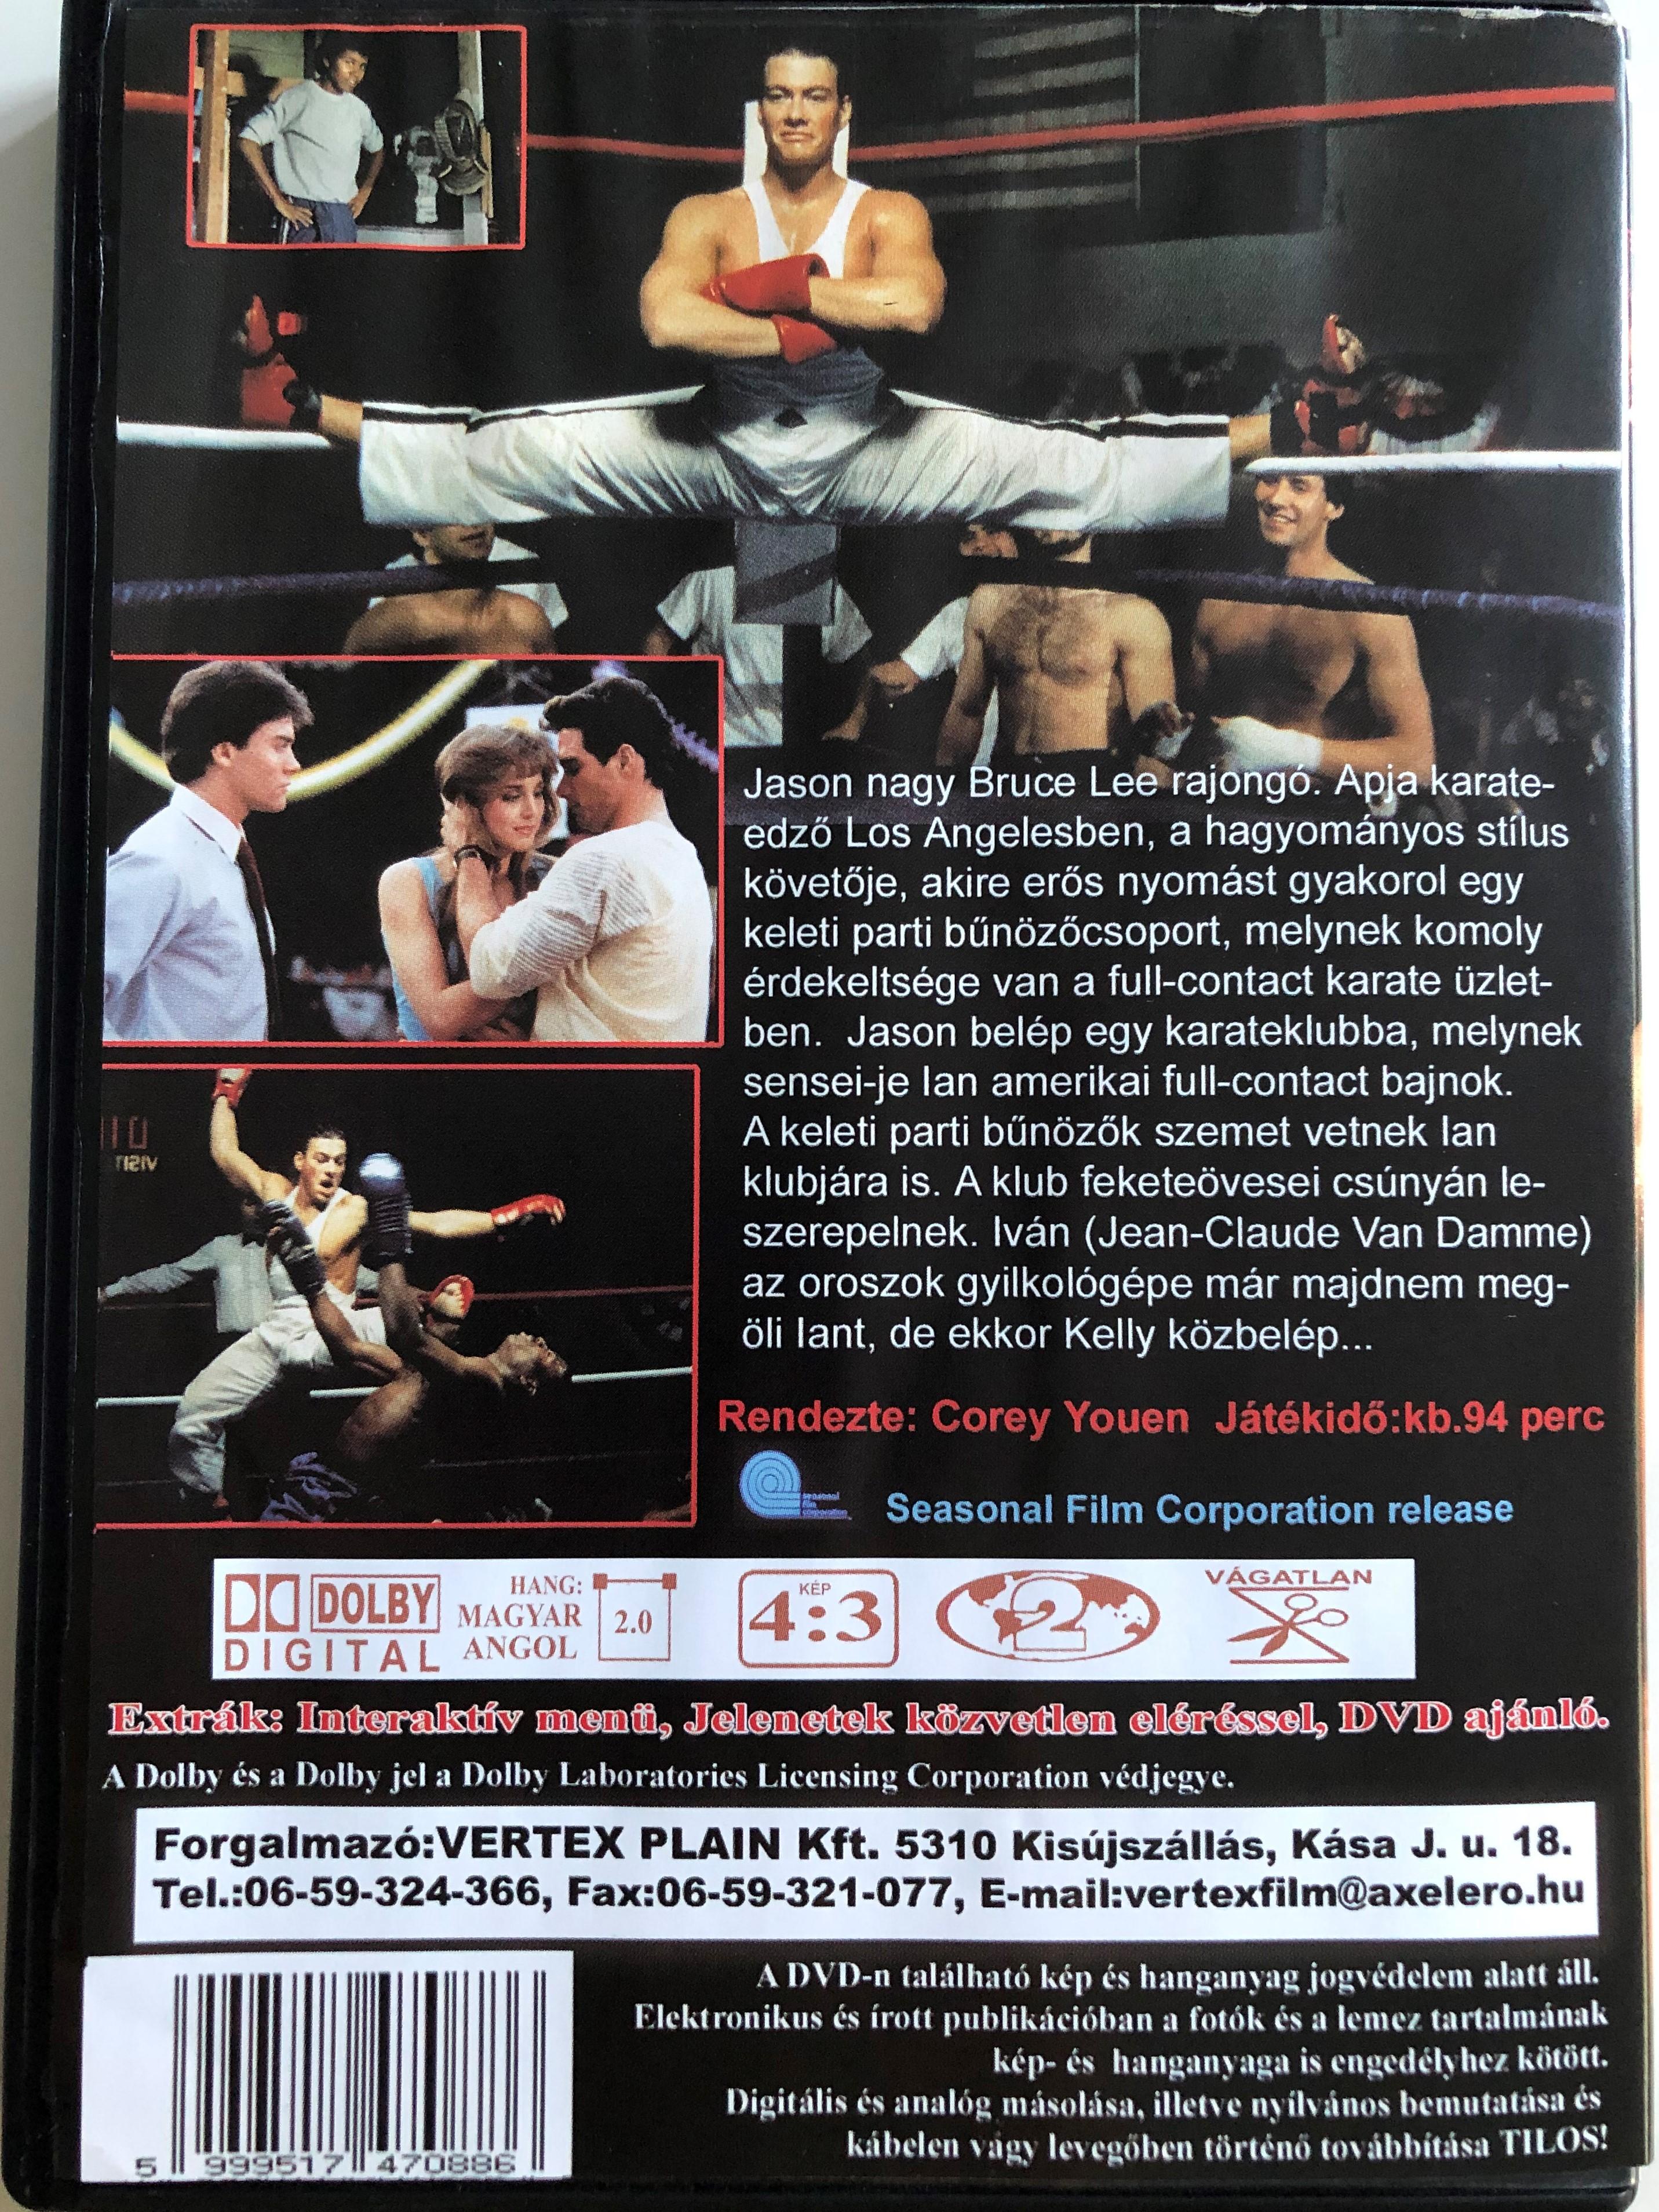 no-retreat-no-surrender-dvd-1985-karate-tigris-1.-nincs-irgalom-directed-by-corey-youen-starring-kurt-mckinney-jean-claude-van-damme-2-.jpg